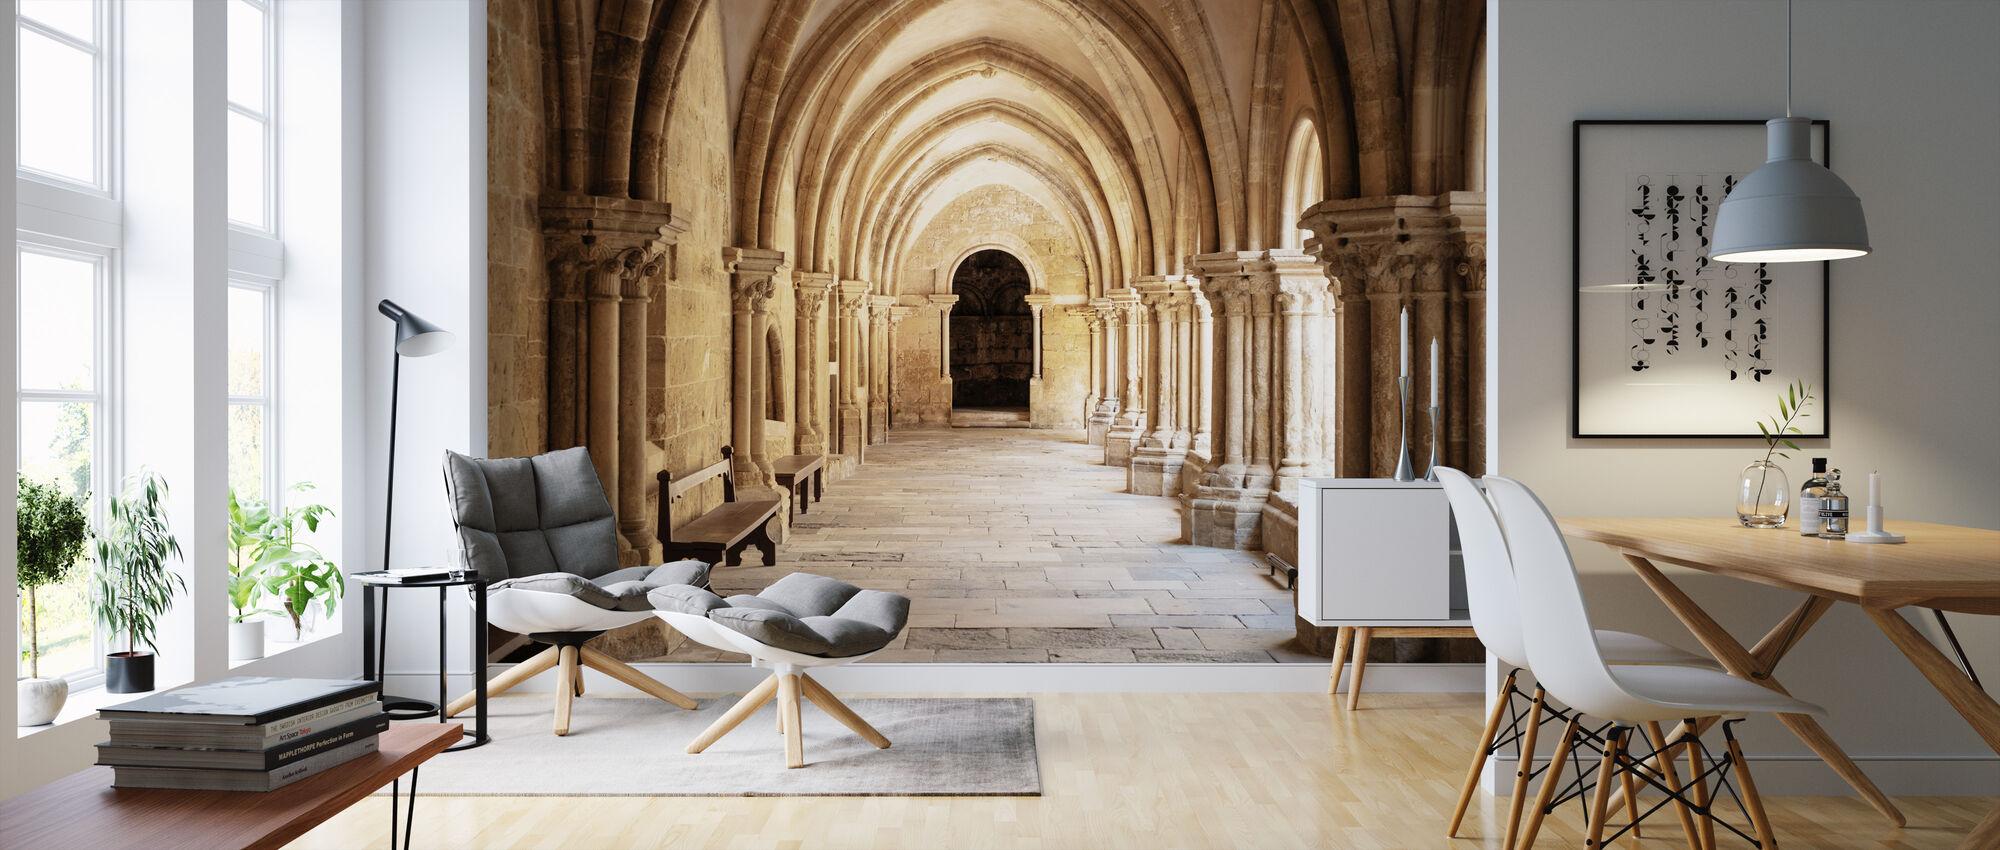 Column Architecture - Wallpaper - Living Room